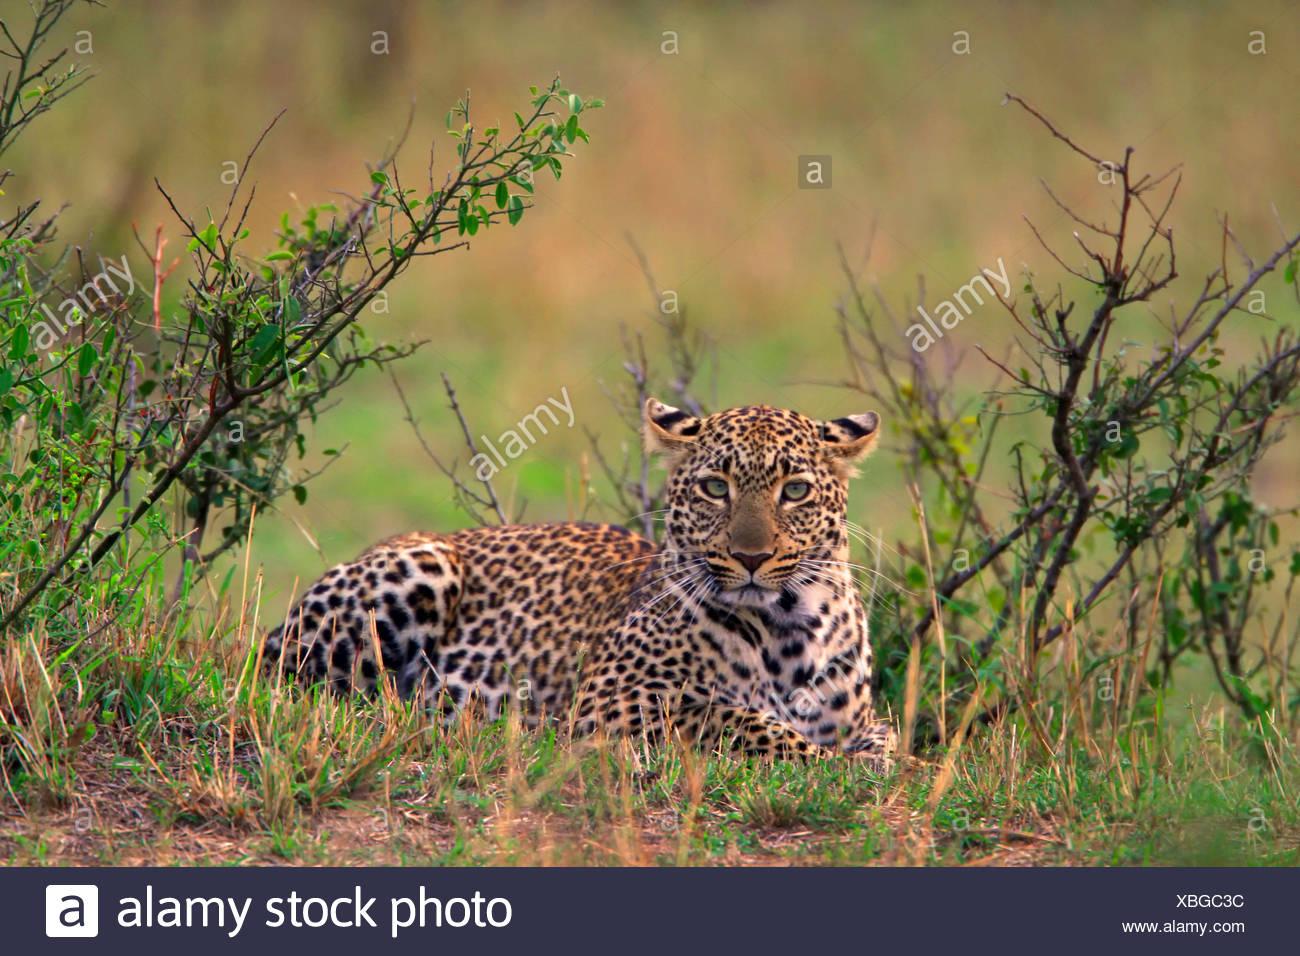 leopard (Panthera pardus), lying in thicket, Kenya, Masai Mara National Park - Stock Image